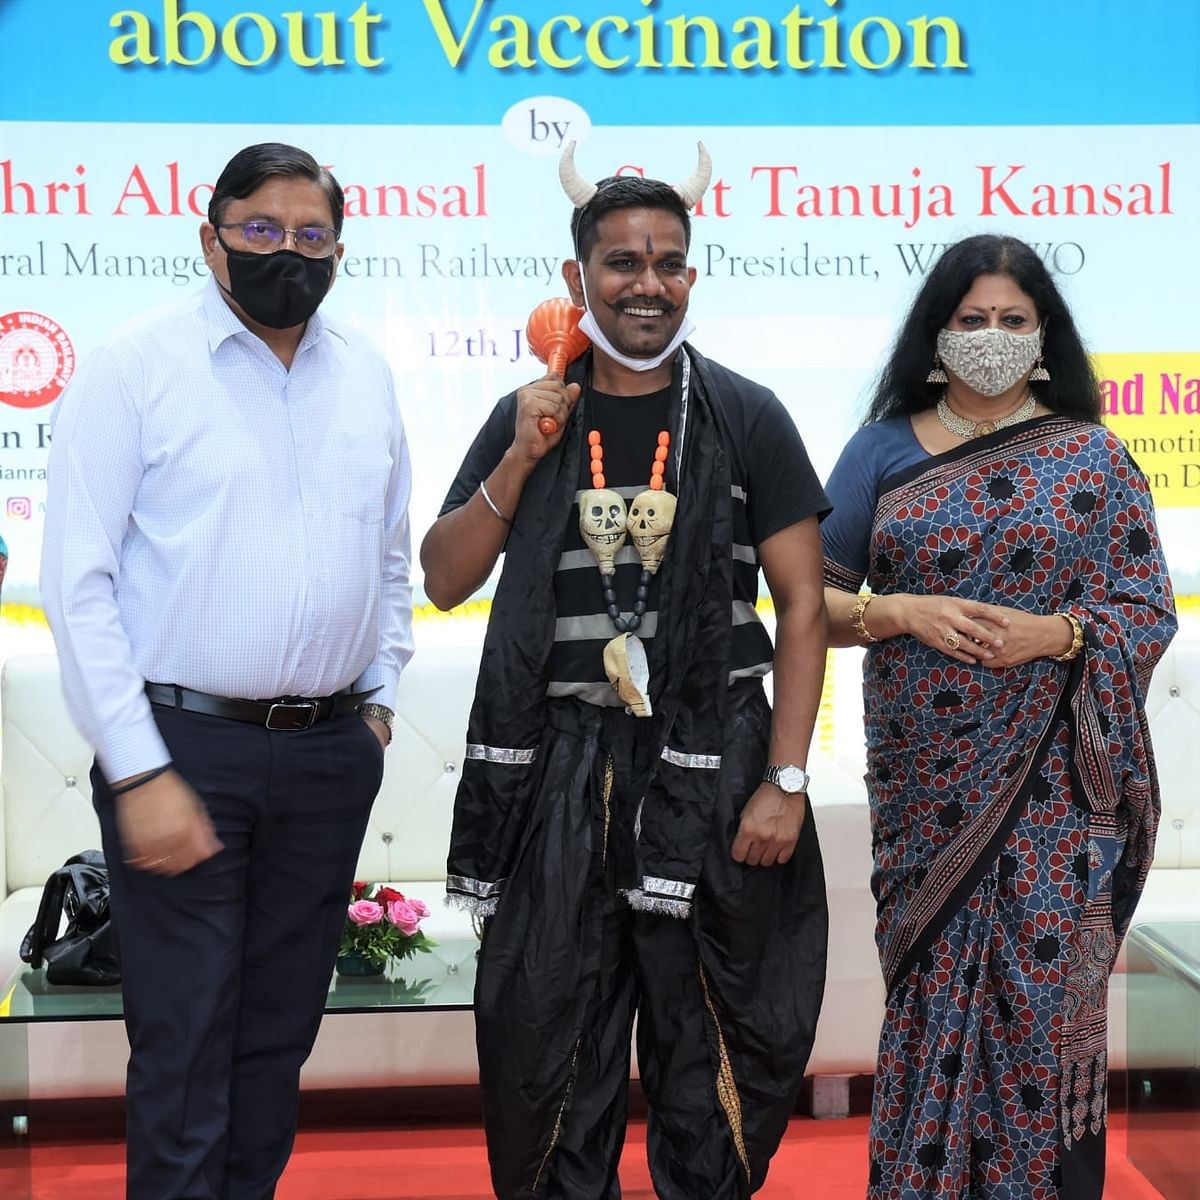 WRWWO organises vaccination awareness drive at Mumbai Central station